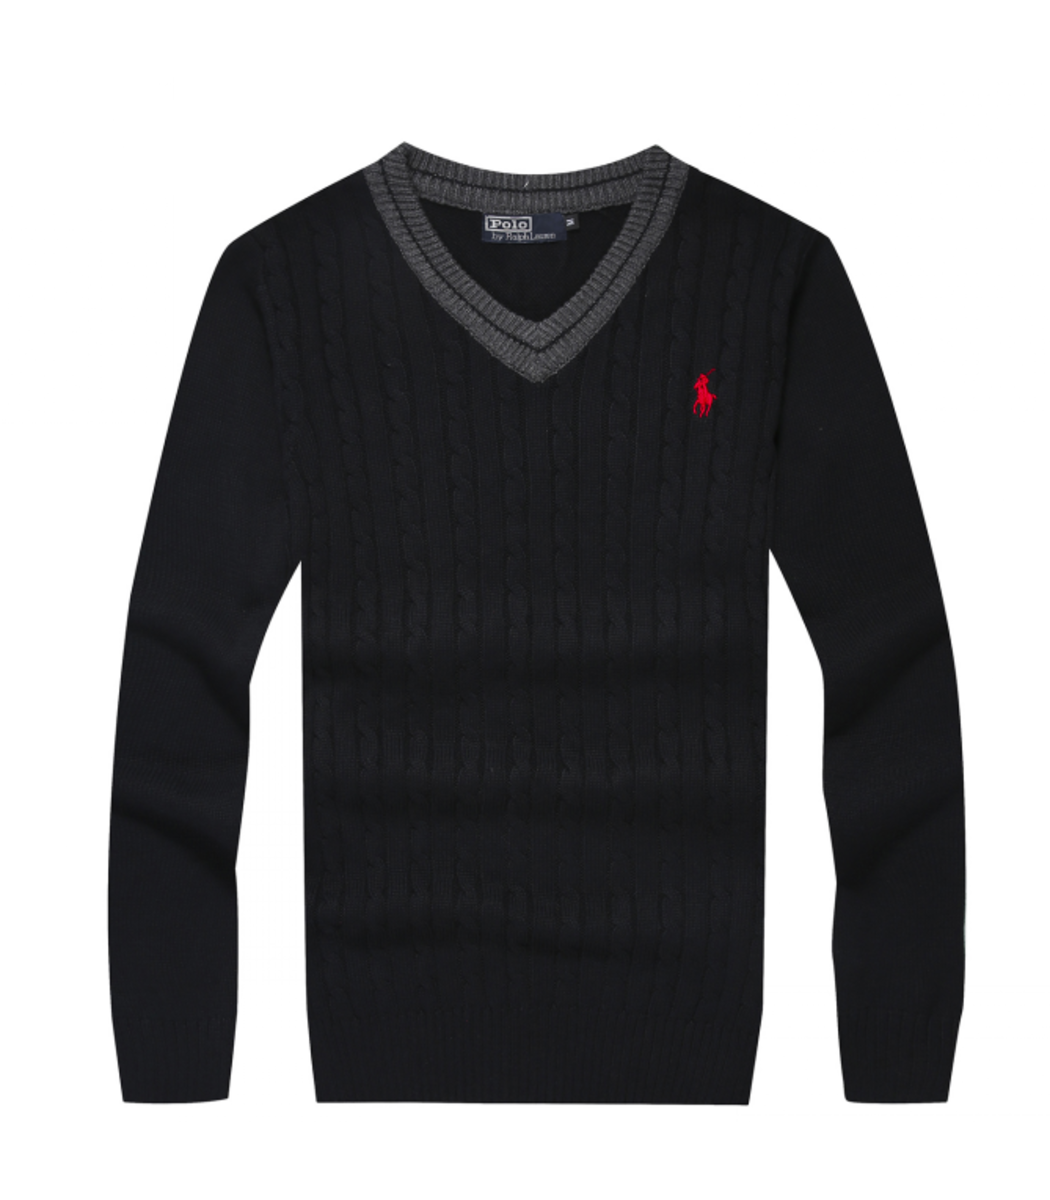 Черный пуловер POLO Ralph Lauren VR1